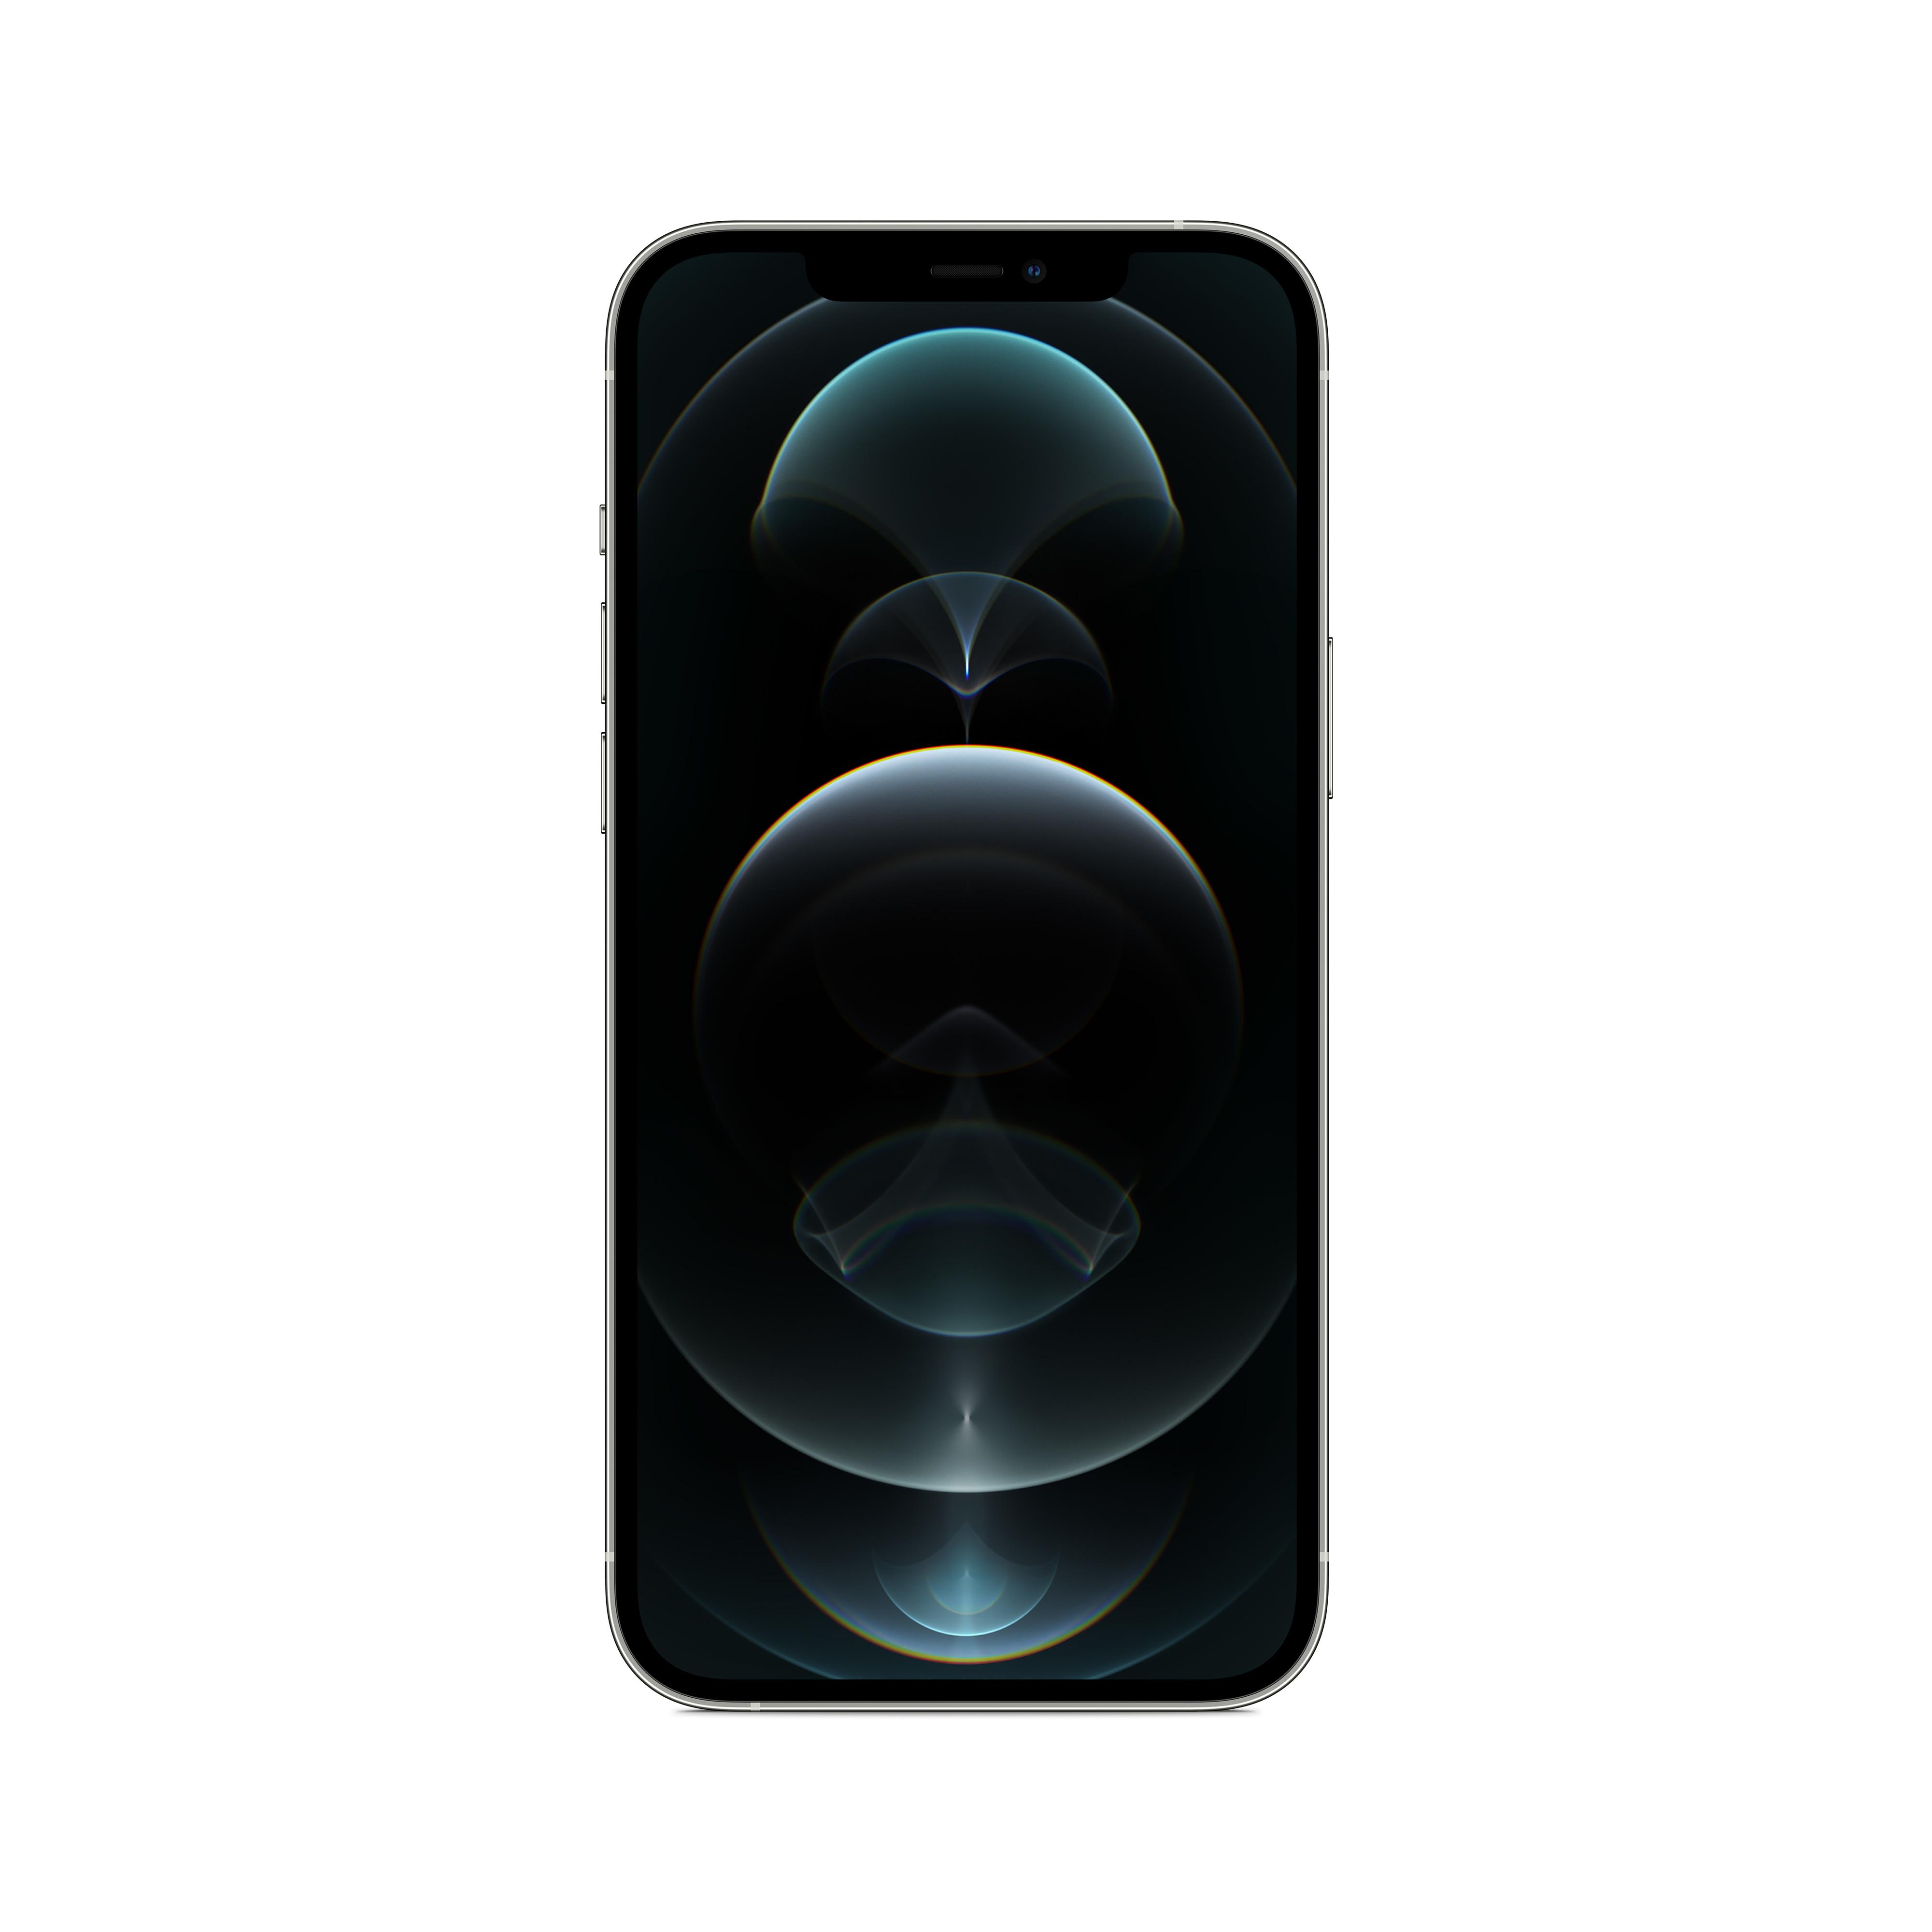 Apple - iPhone 12 Pro Max 128gb Silver